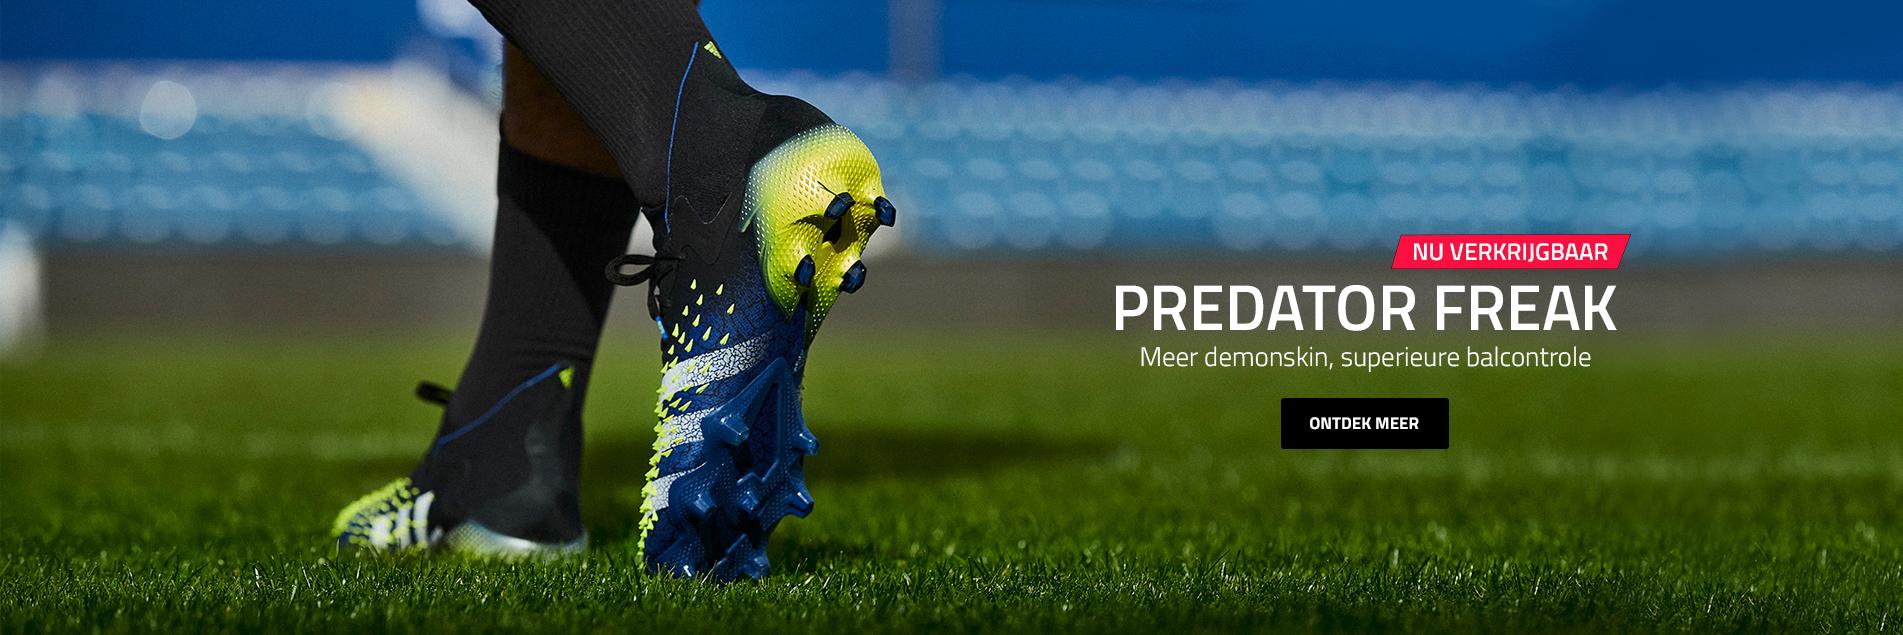 adidas Superlative Predator Freak